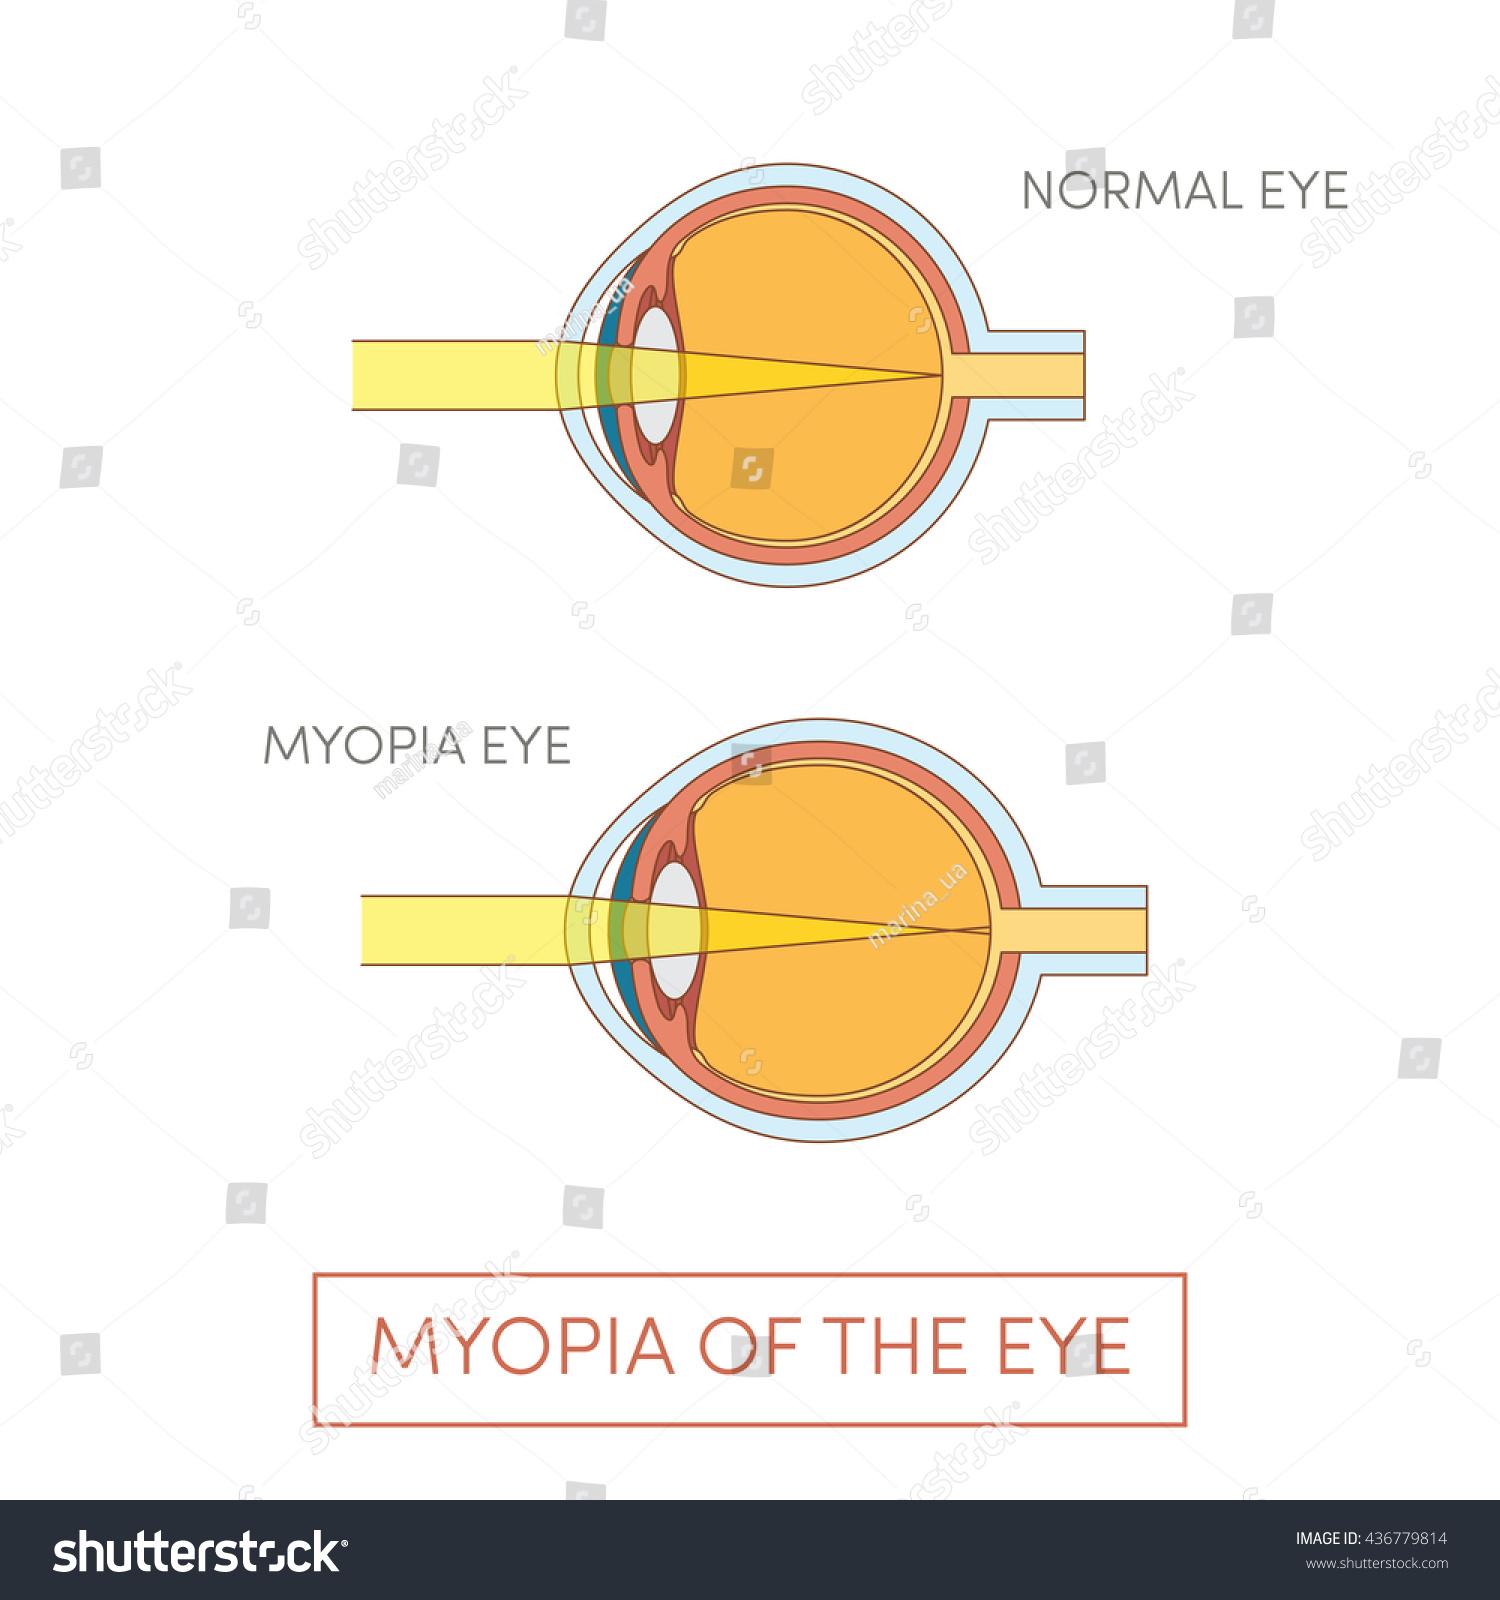 hight resolution of myopia of the eye vector illustration